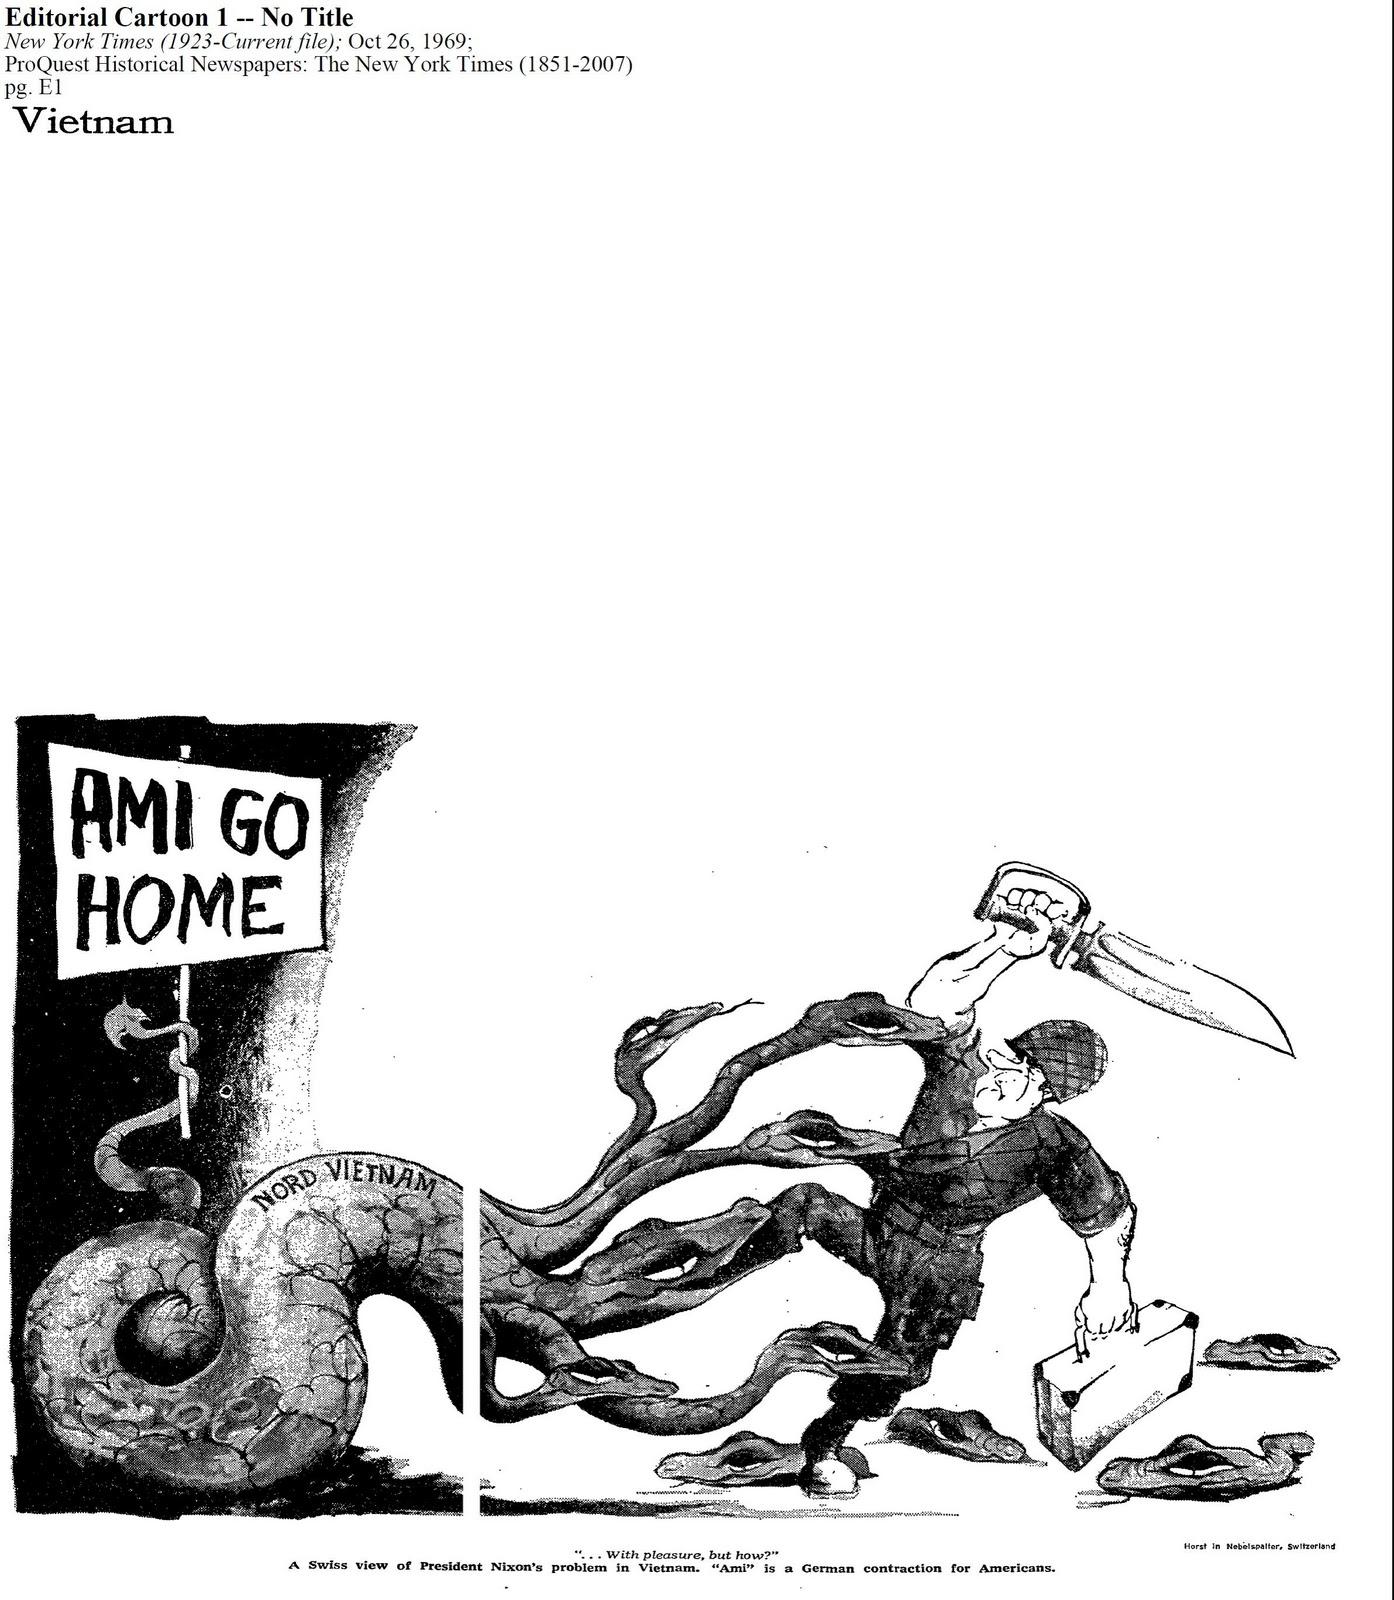 The Vietnam War: One of America's Regrets: DBQ: Political